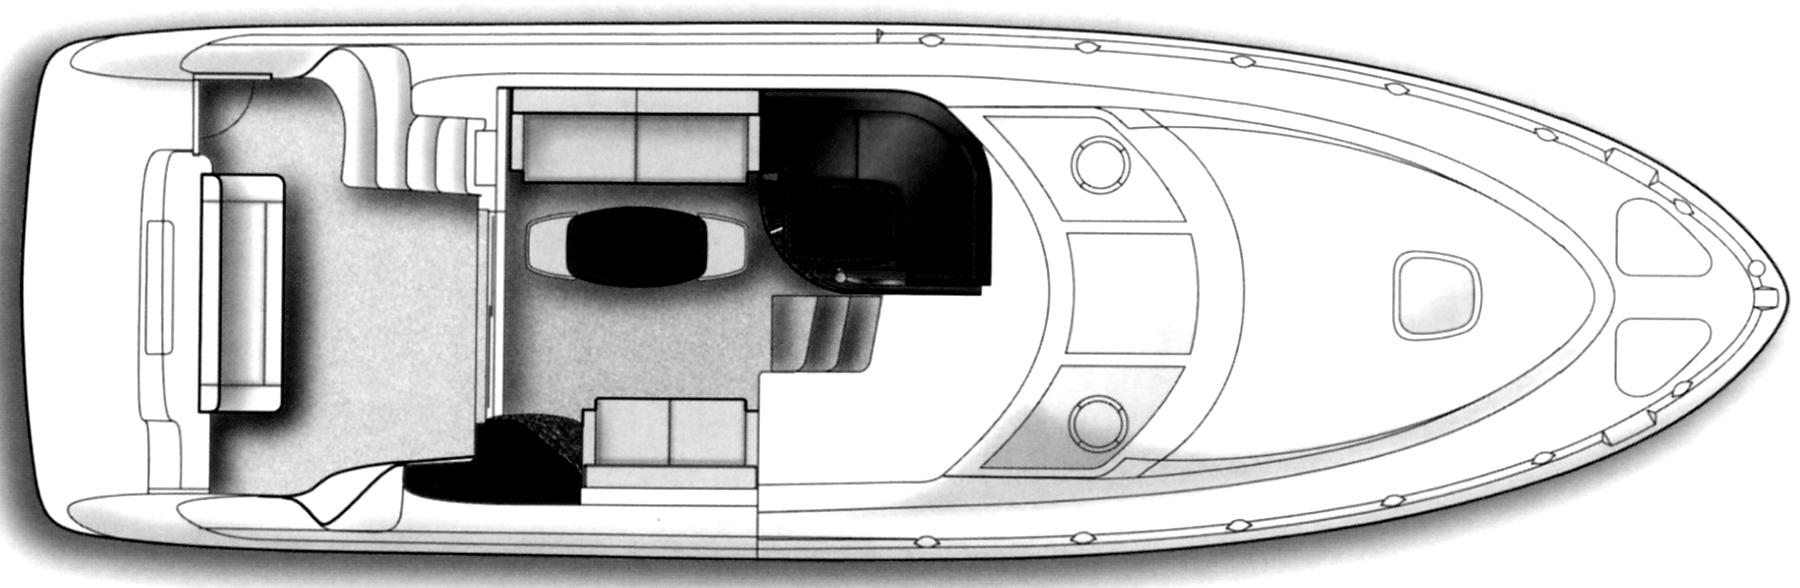 420 Sedan Bridge; 44 Sedan Bridge Floor Plan 2